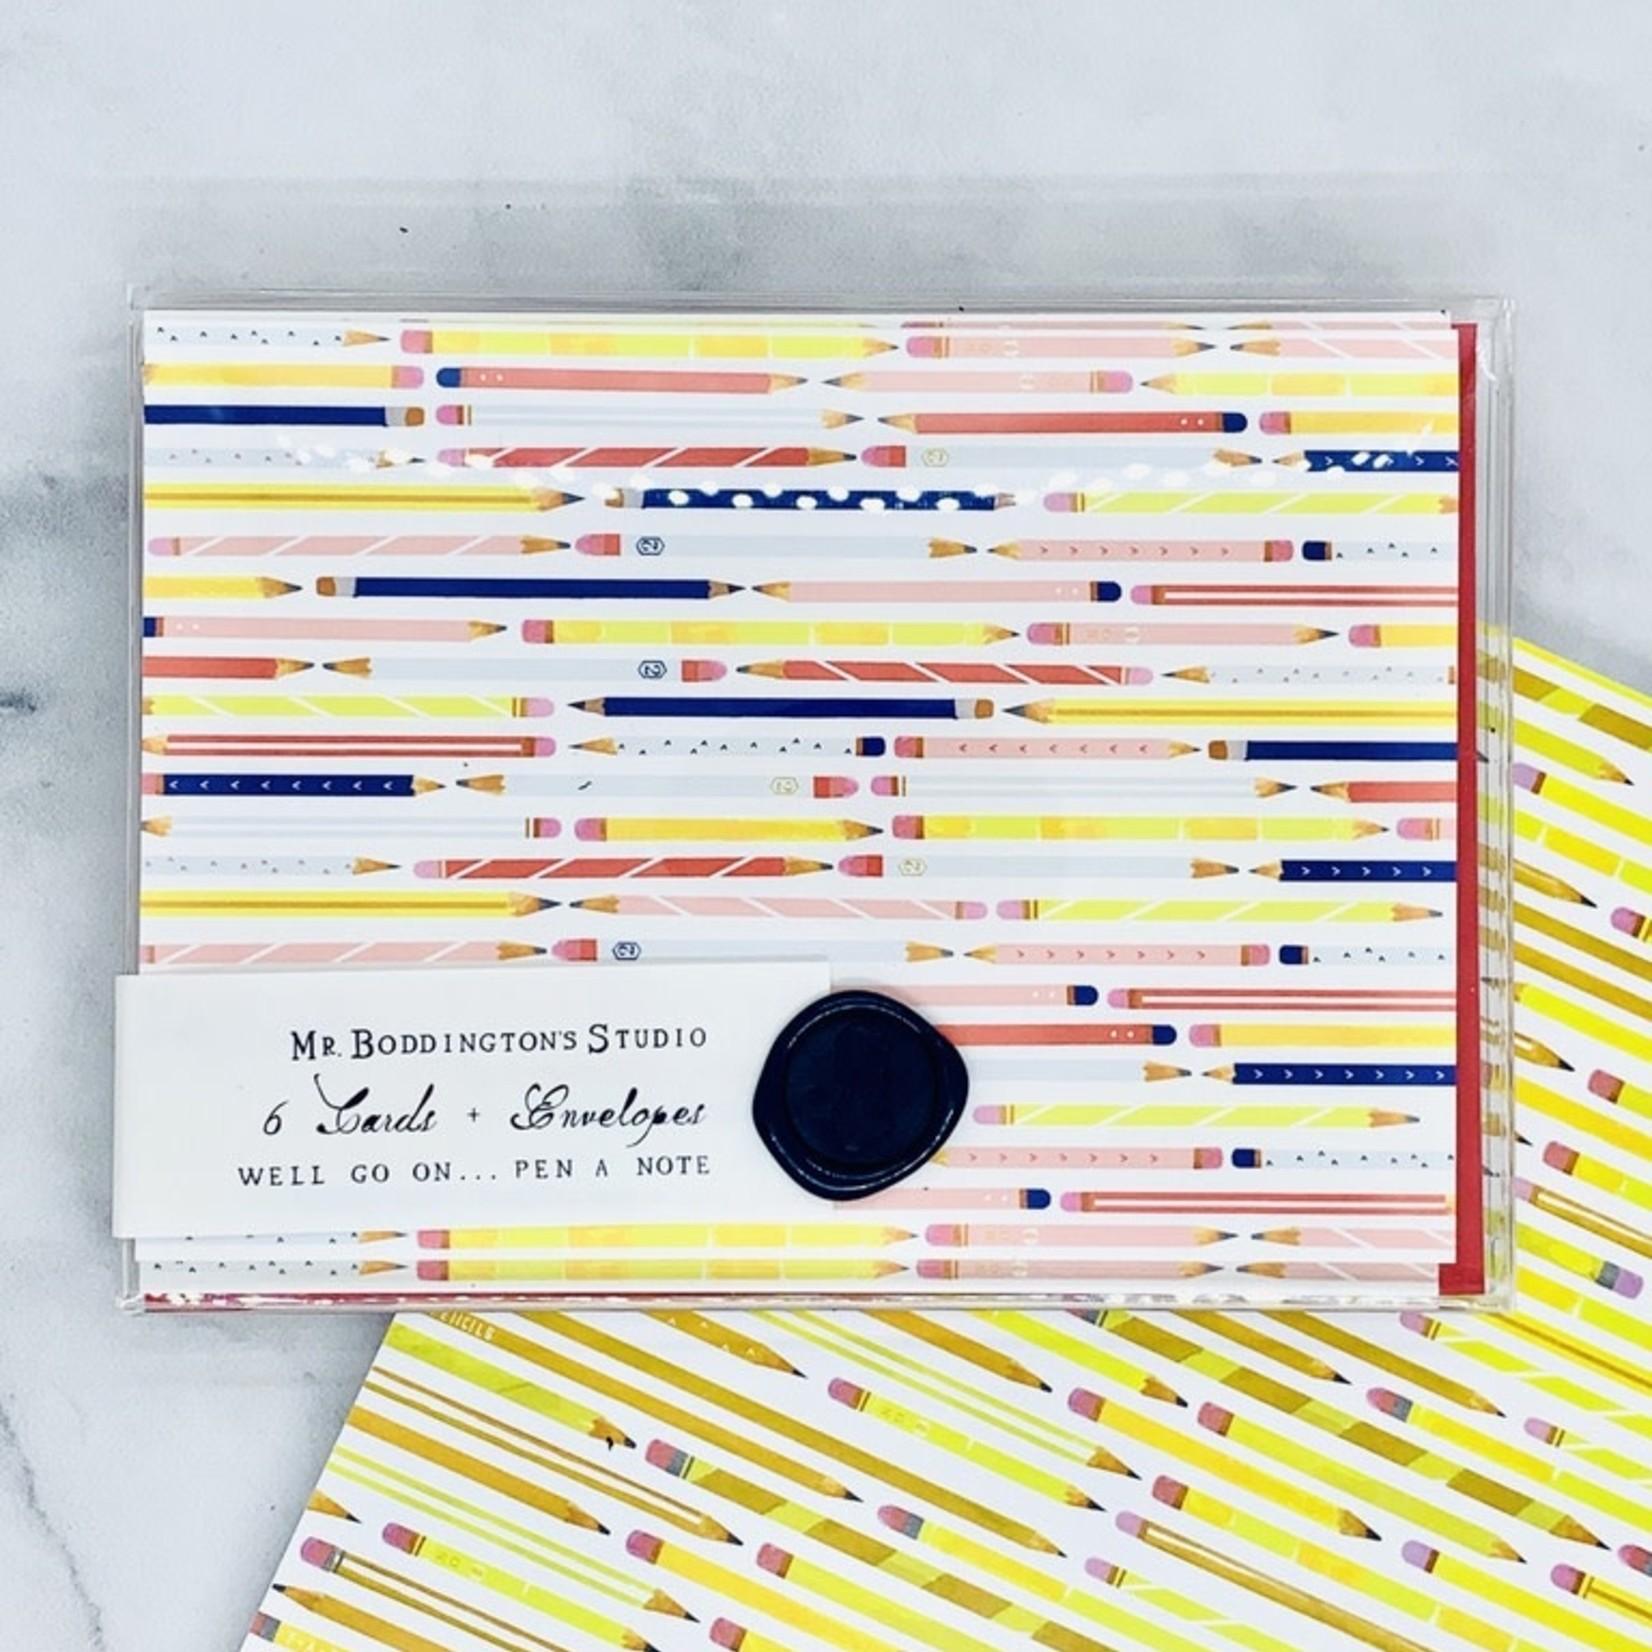 Mr. Boddington's Studio Bring Your Pencils Notecards